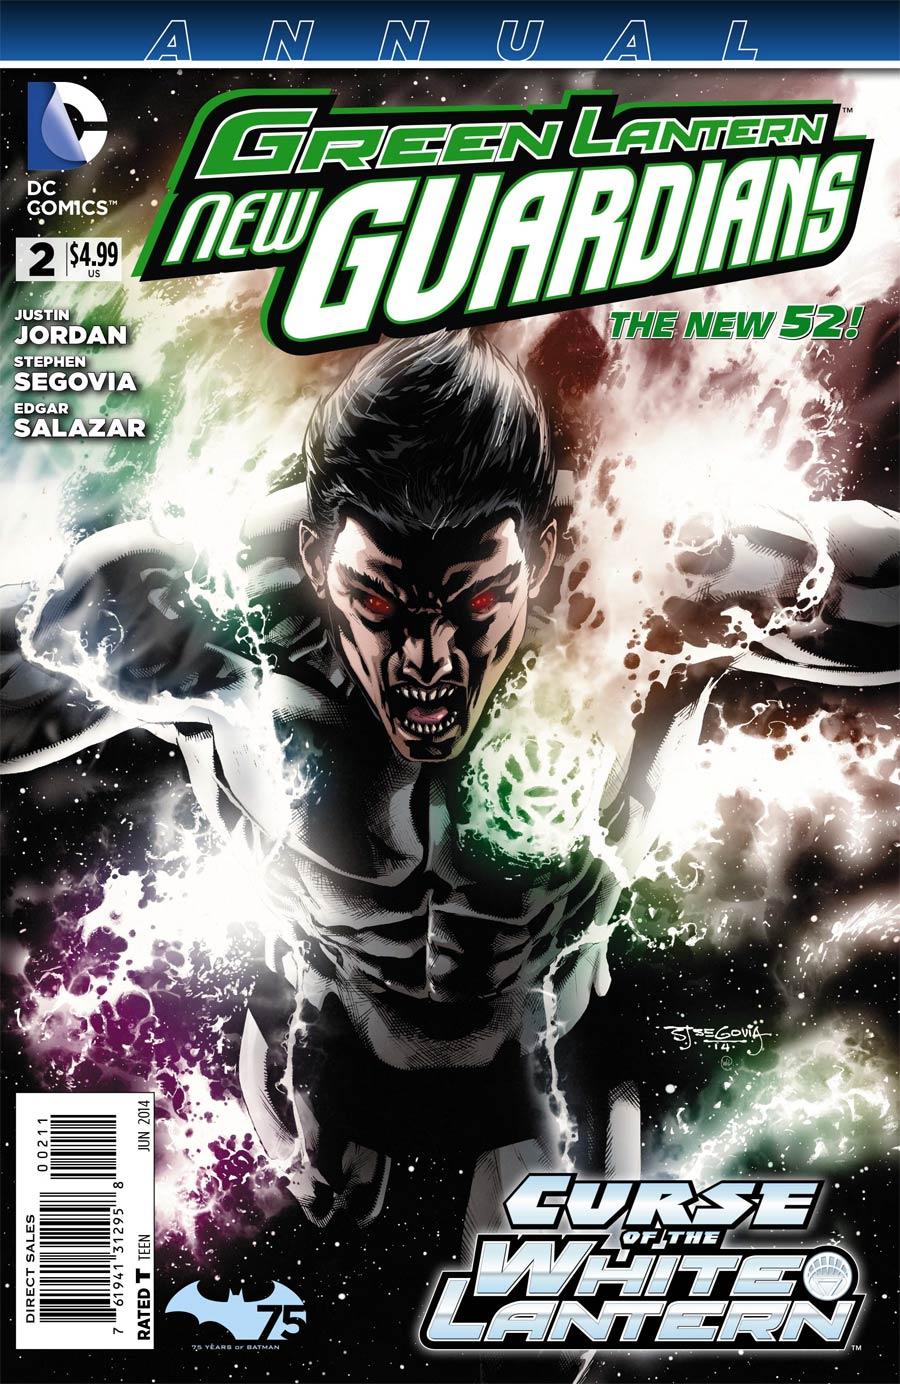 Green Lantern New Guardians Annual #2